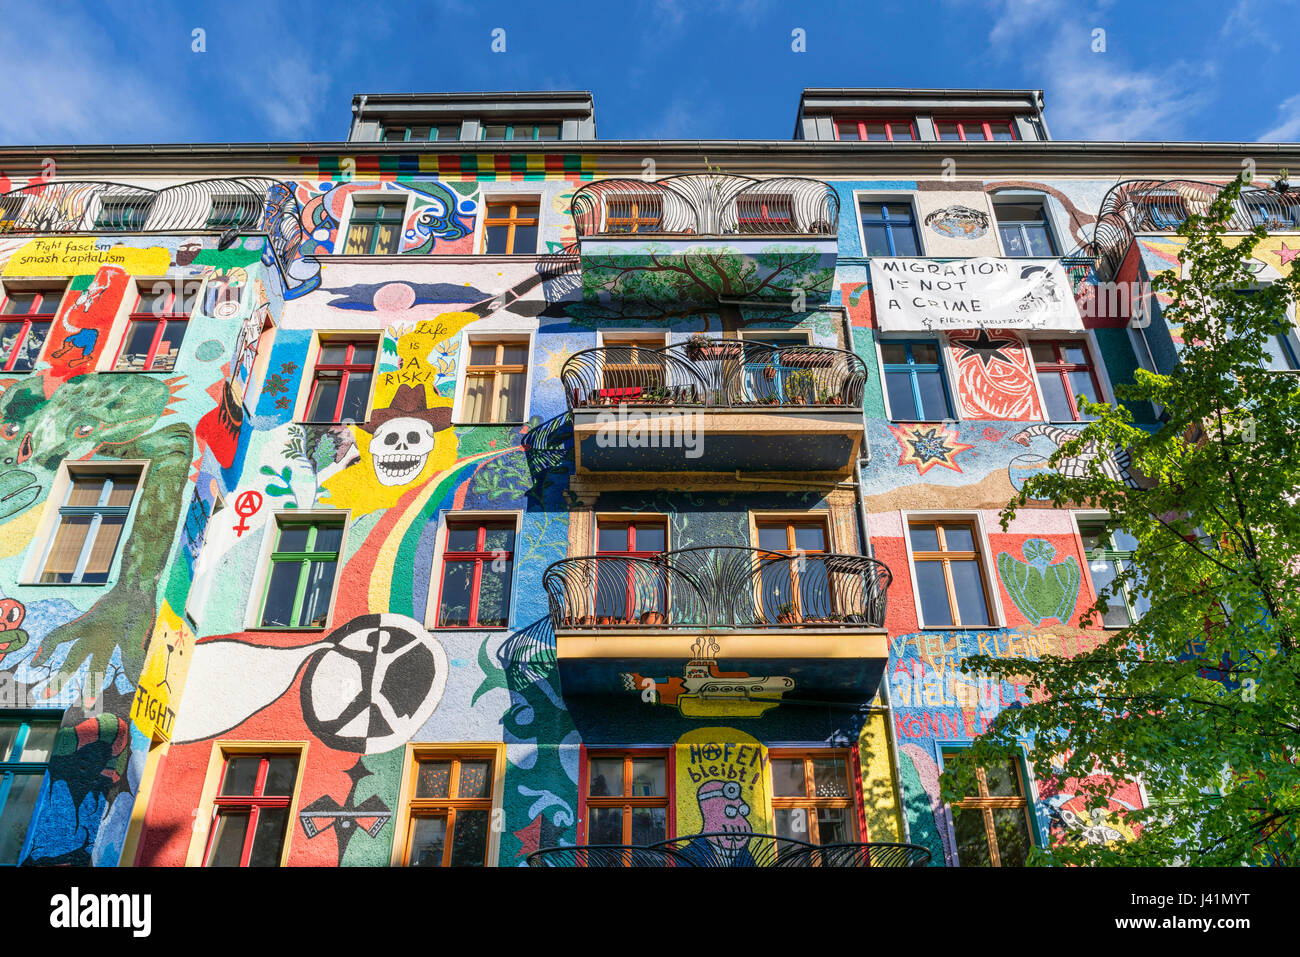 Immobilien stockfotos immobilien bilder alamy - Wandmalerei berlin ...